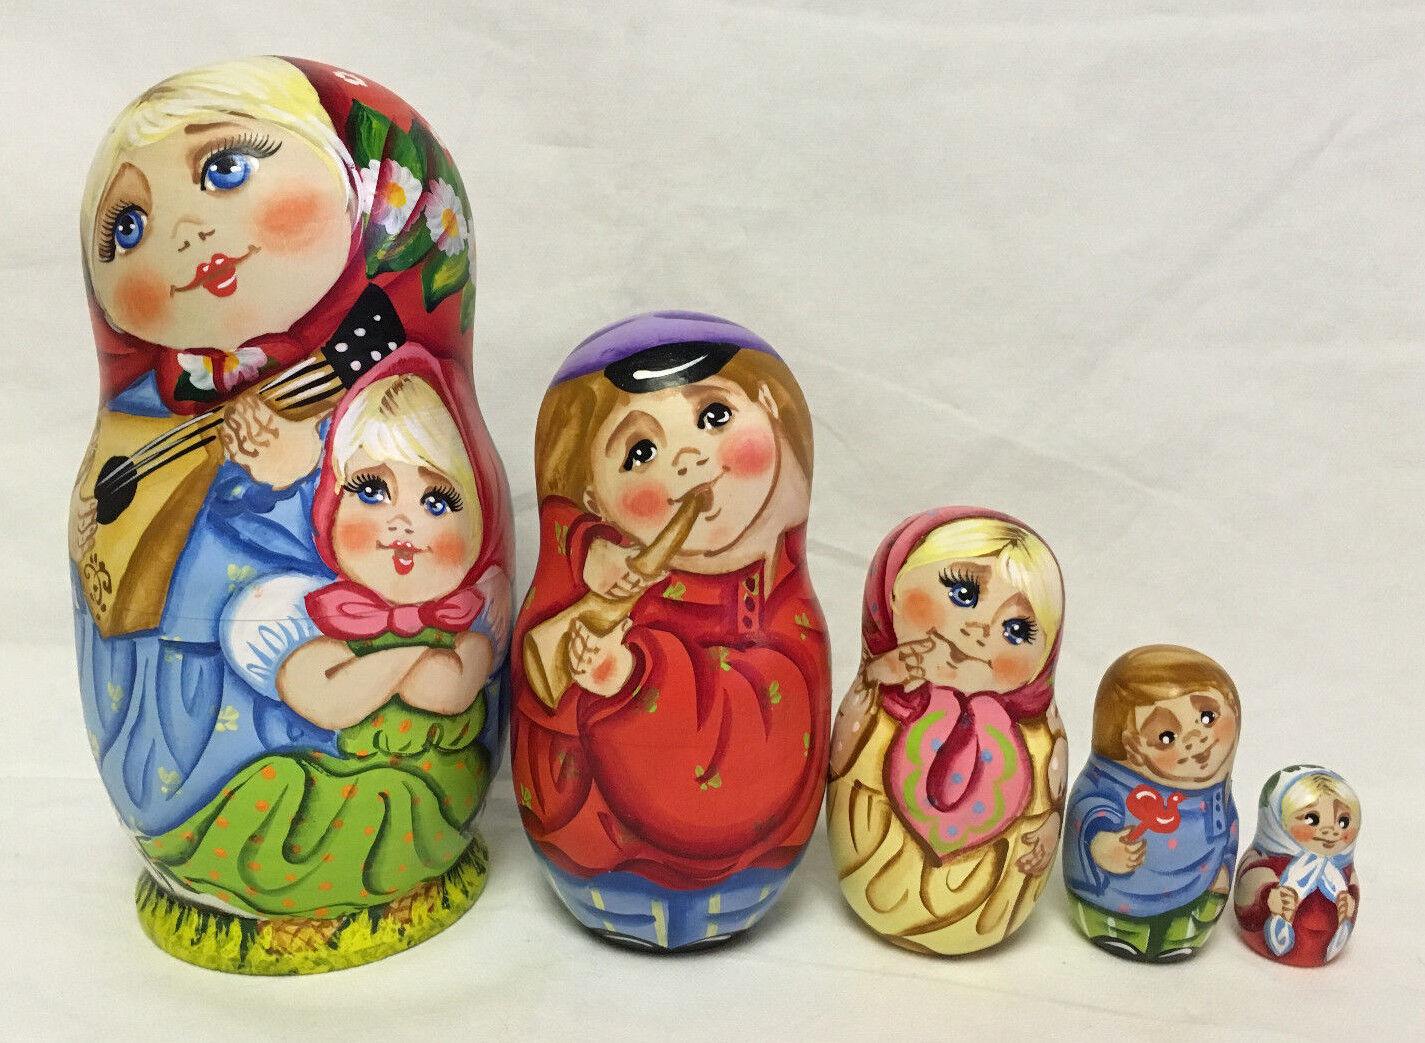 Russian Matryoshka Russian Wooden Nesting Dolls - 5 pieces  11